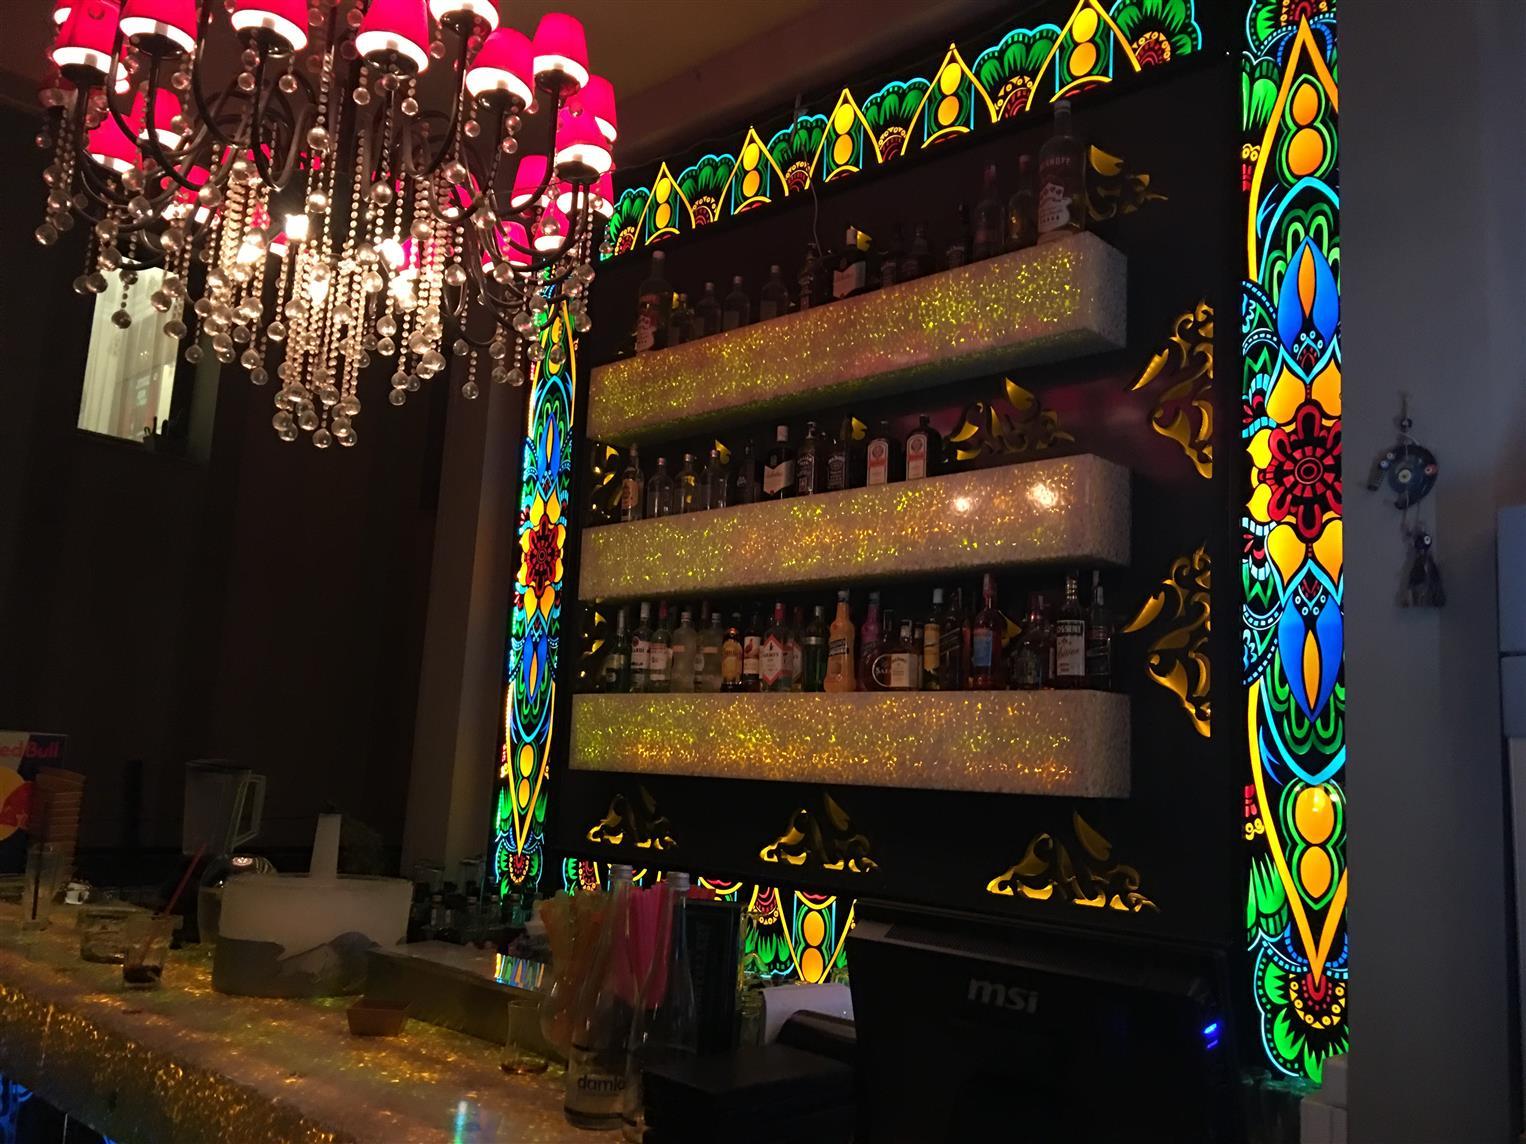 maitia-restoran-guzelyali20165213594528.jpg izmir vitray çalışması